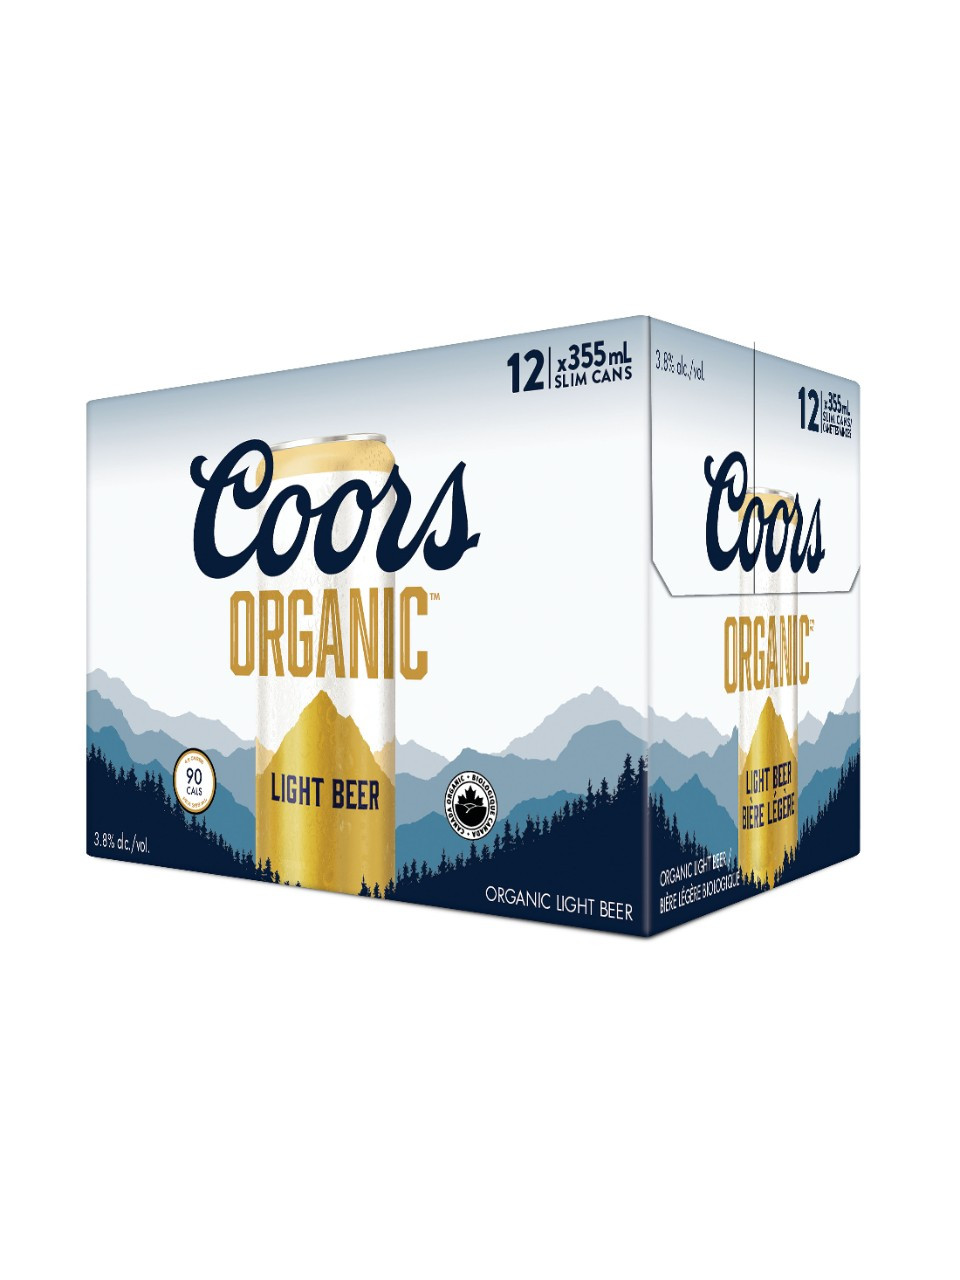 Coors organic  12 x 355 ml